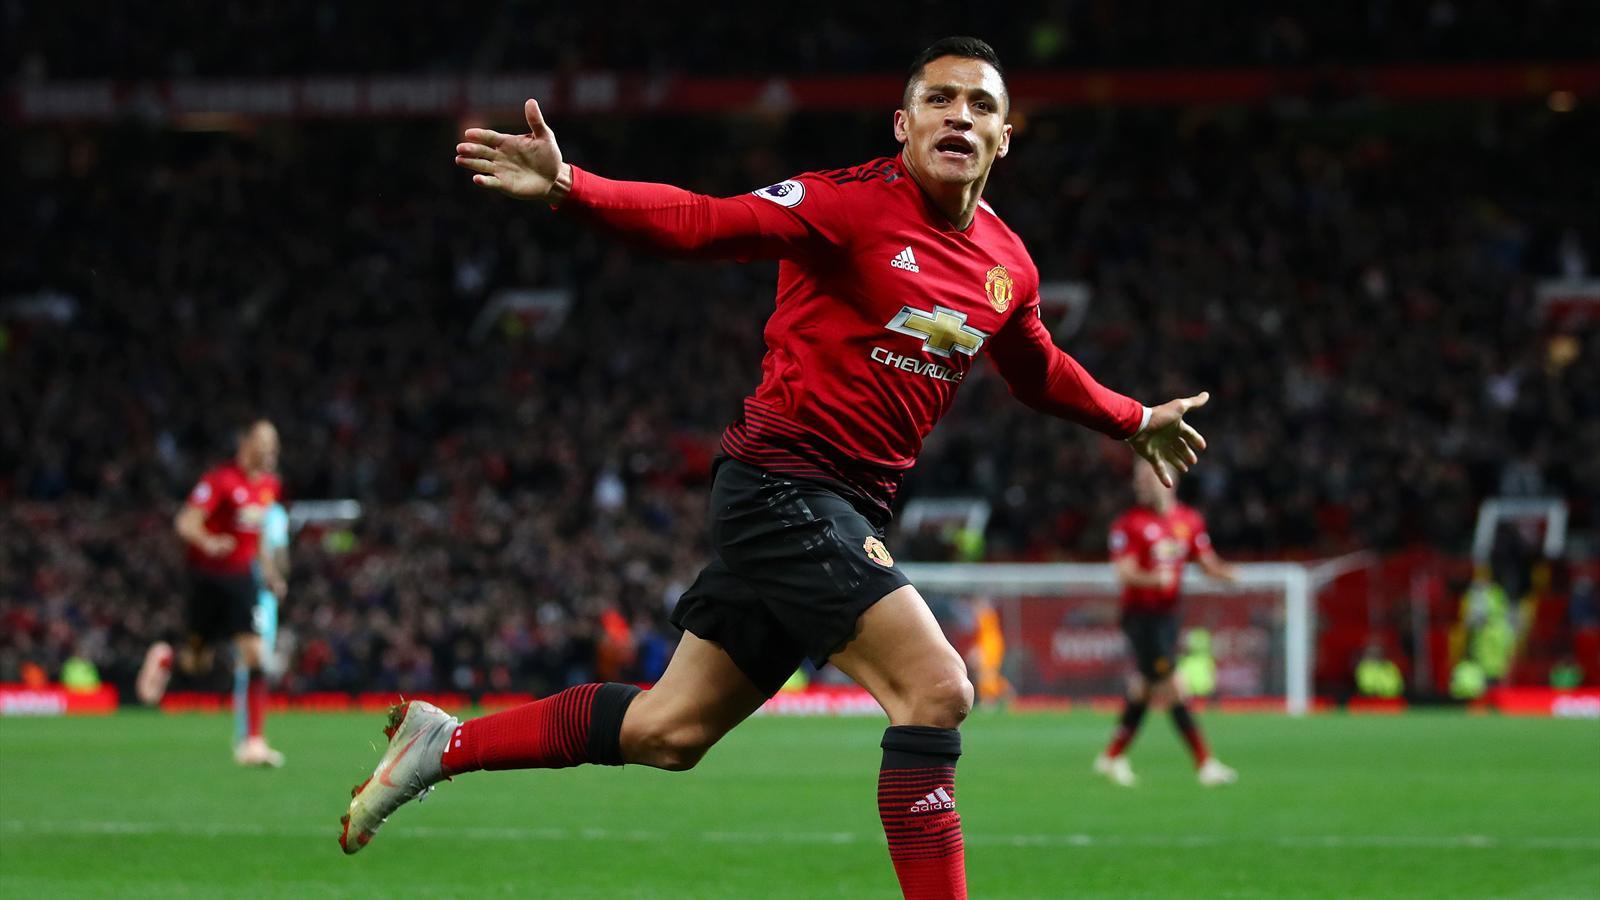 e88477921b4 Football news - Paper Round  Alexis Sanchez wages preventing deals for  Martial and De Gea